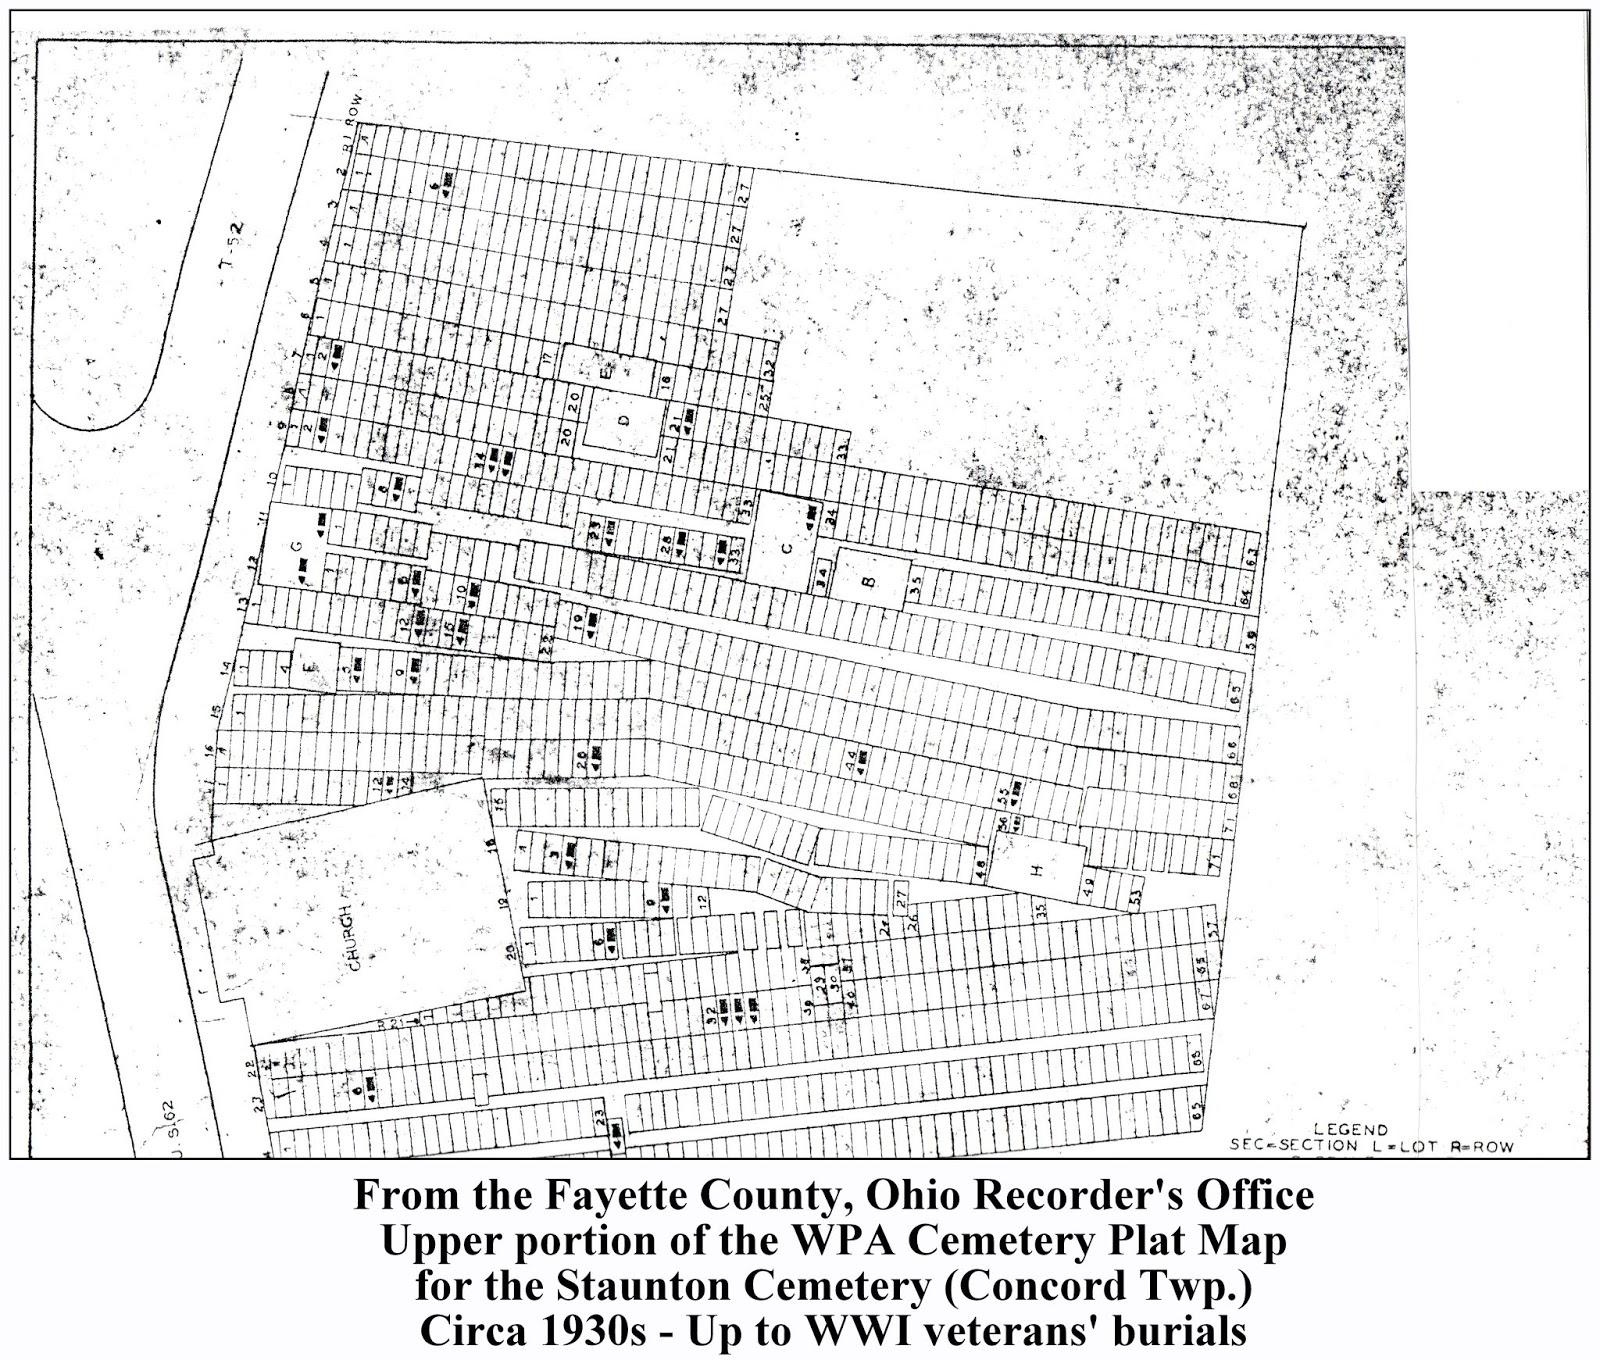 Spotlighting the Staunton Methodist Cemetery